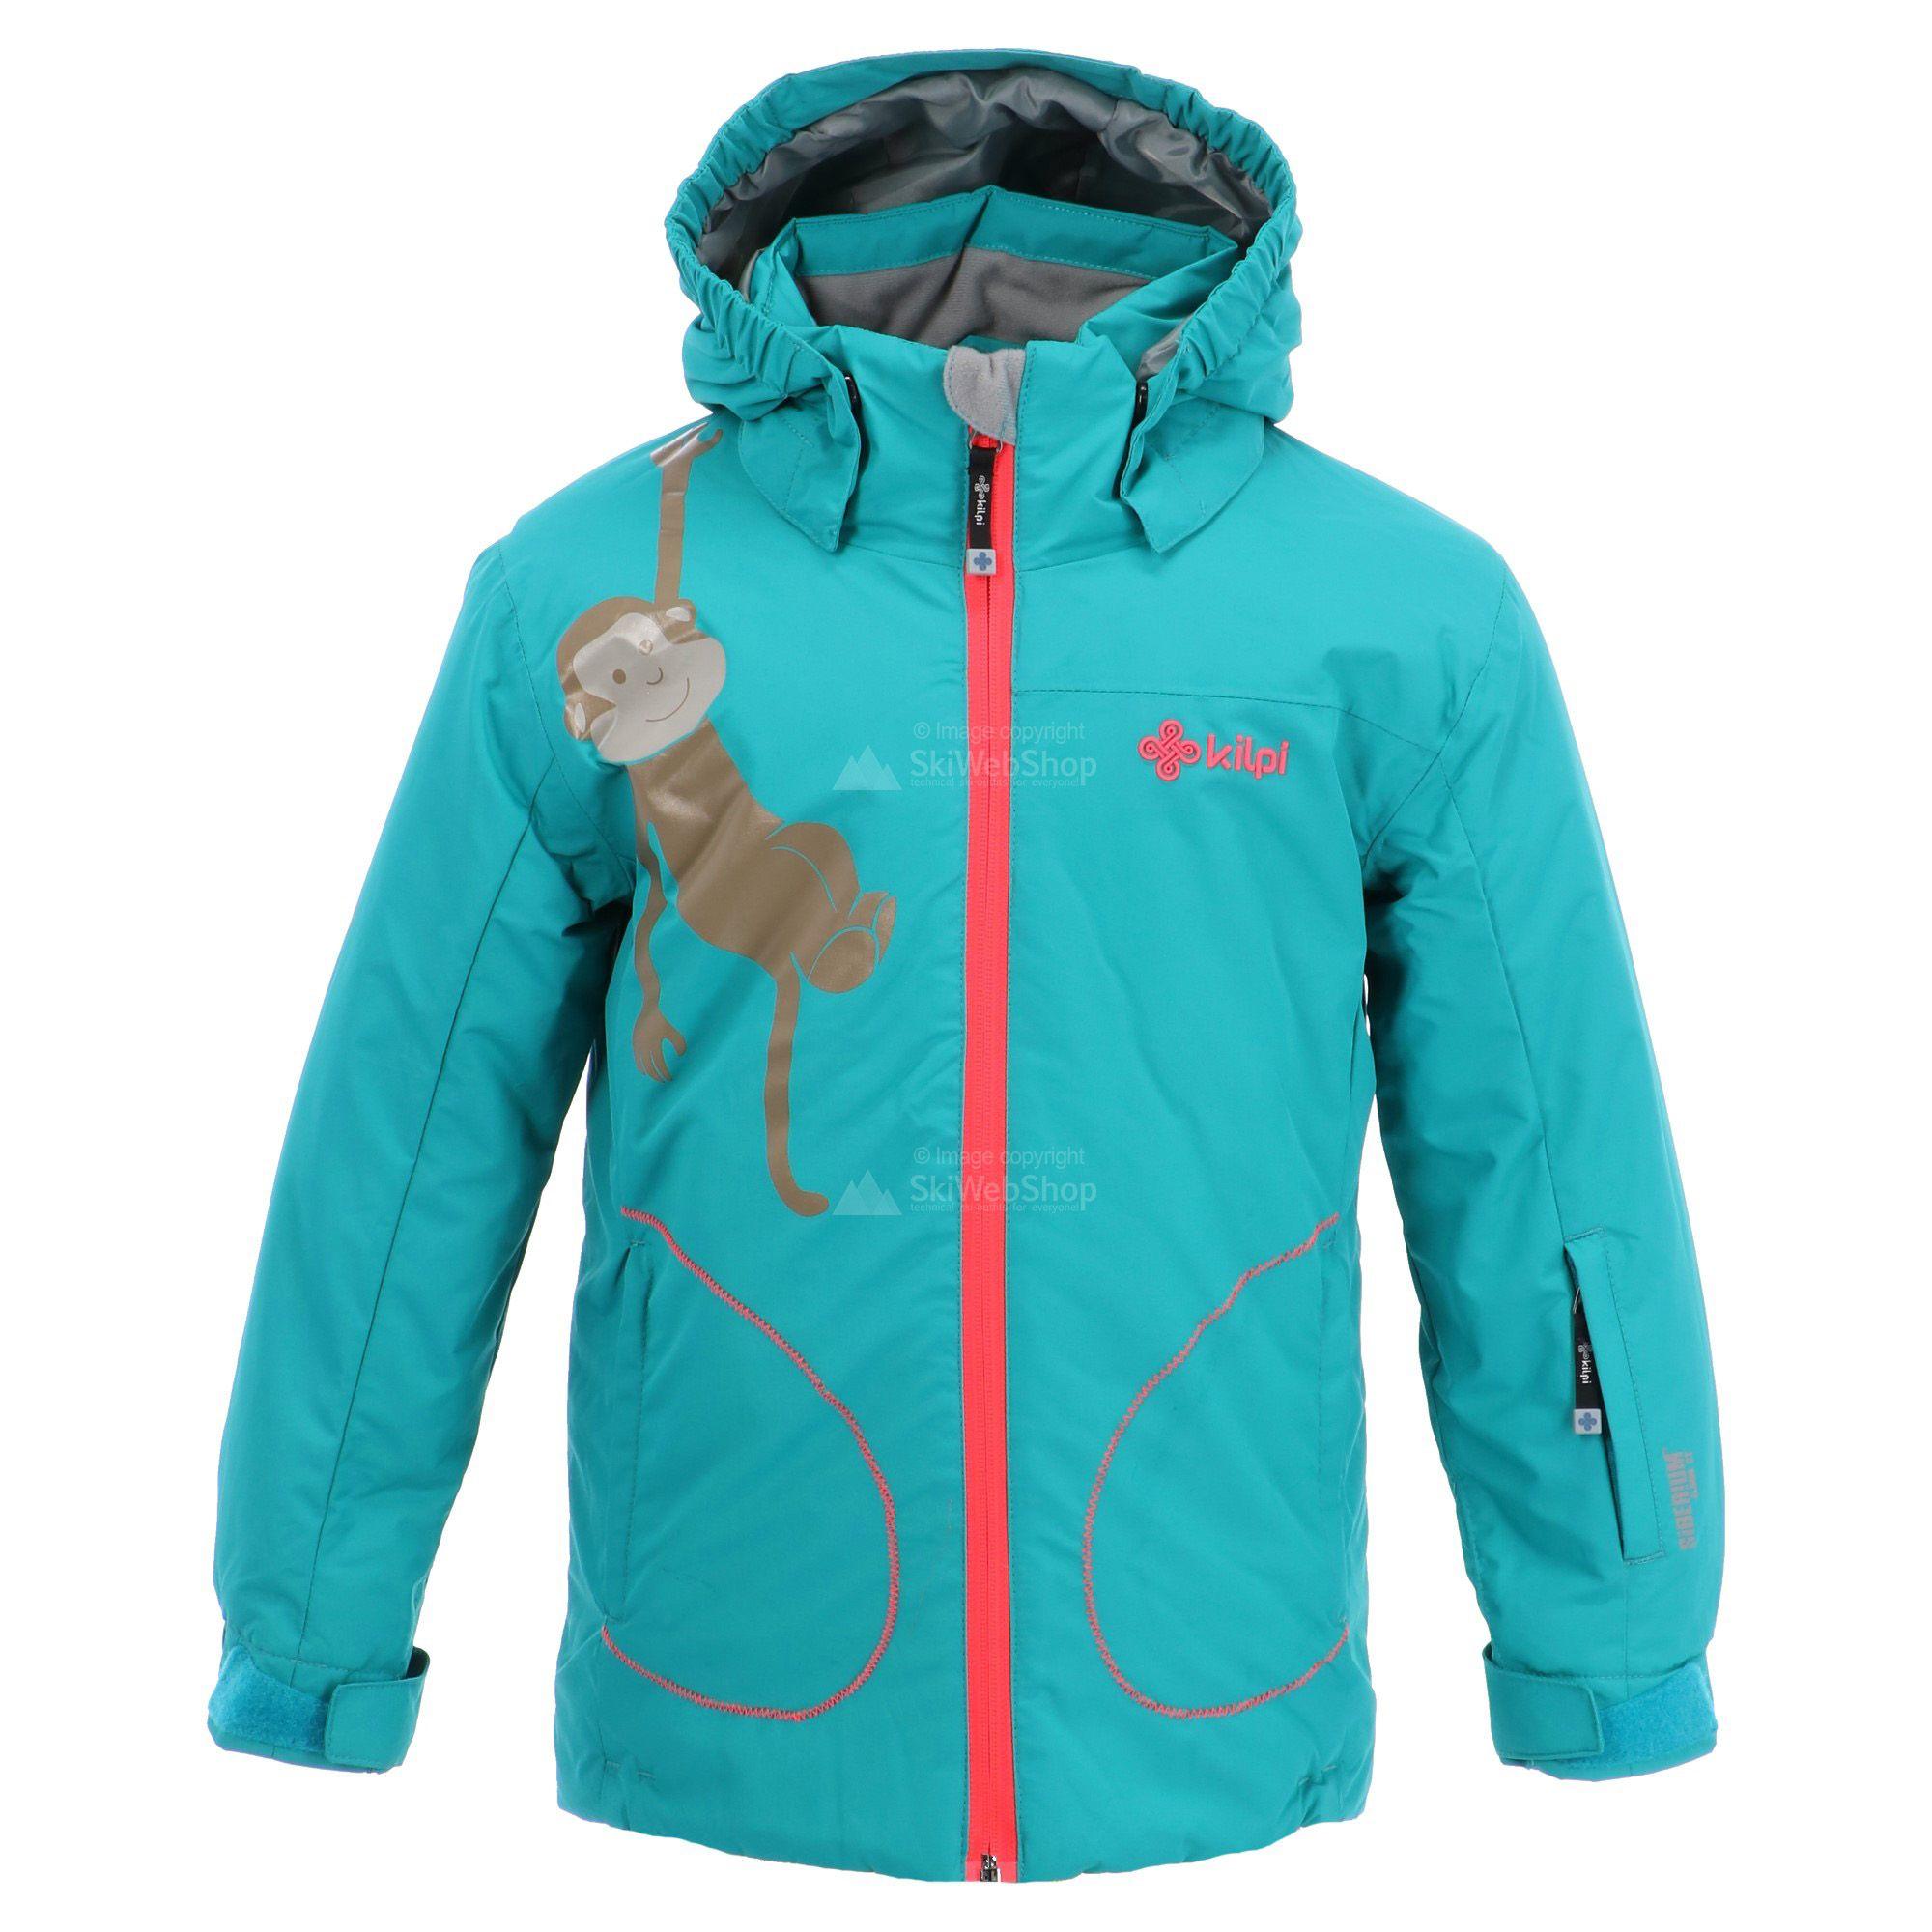 Kilpi, Cindy JG, giacca invernale, bambino, turquoise blu • SkiWebShop